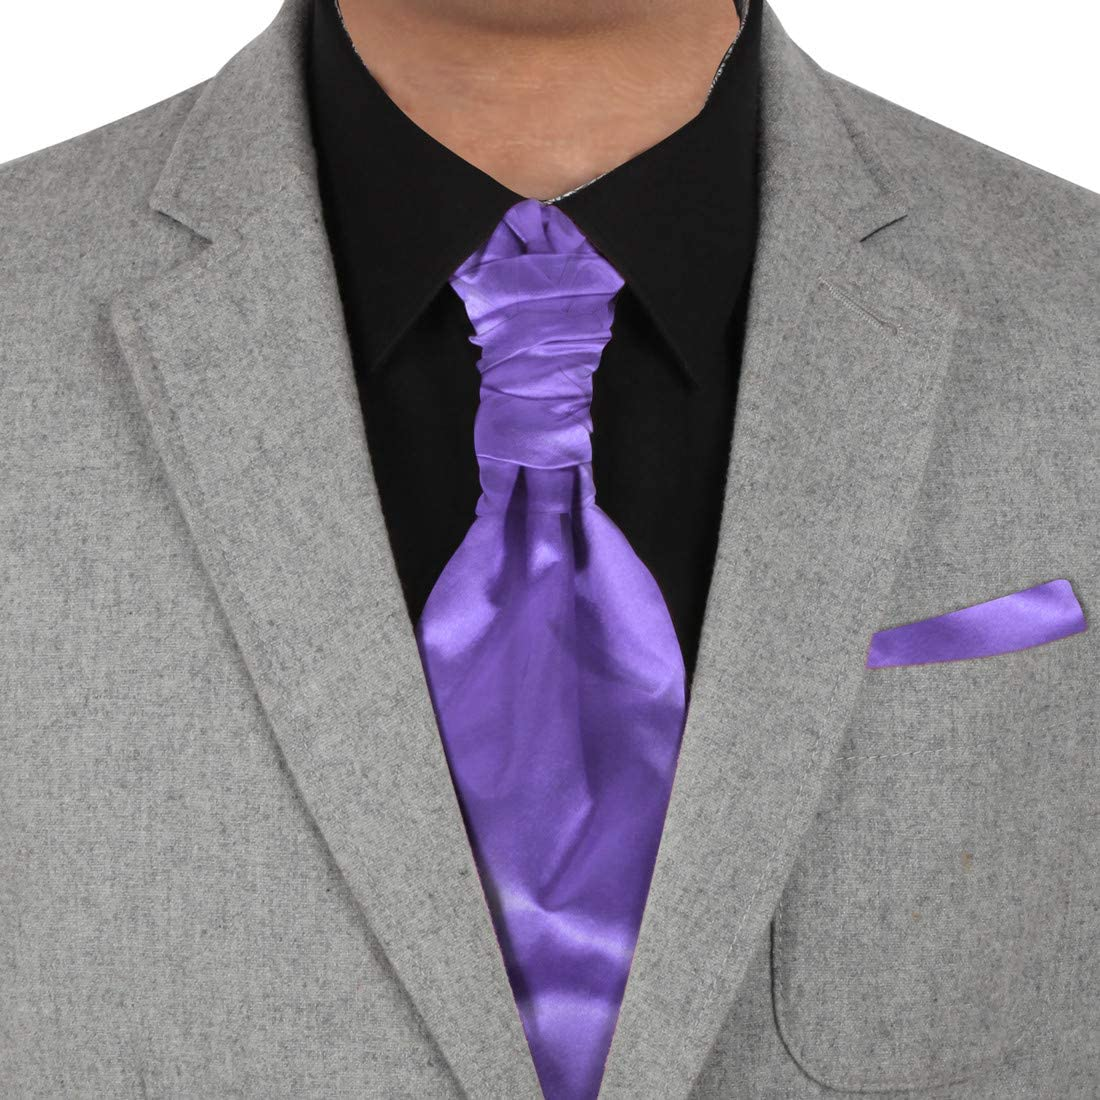 Cravat for Boys Boys Satin Wedding Ruche Cravat Tie with hankys Boys Cravats